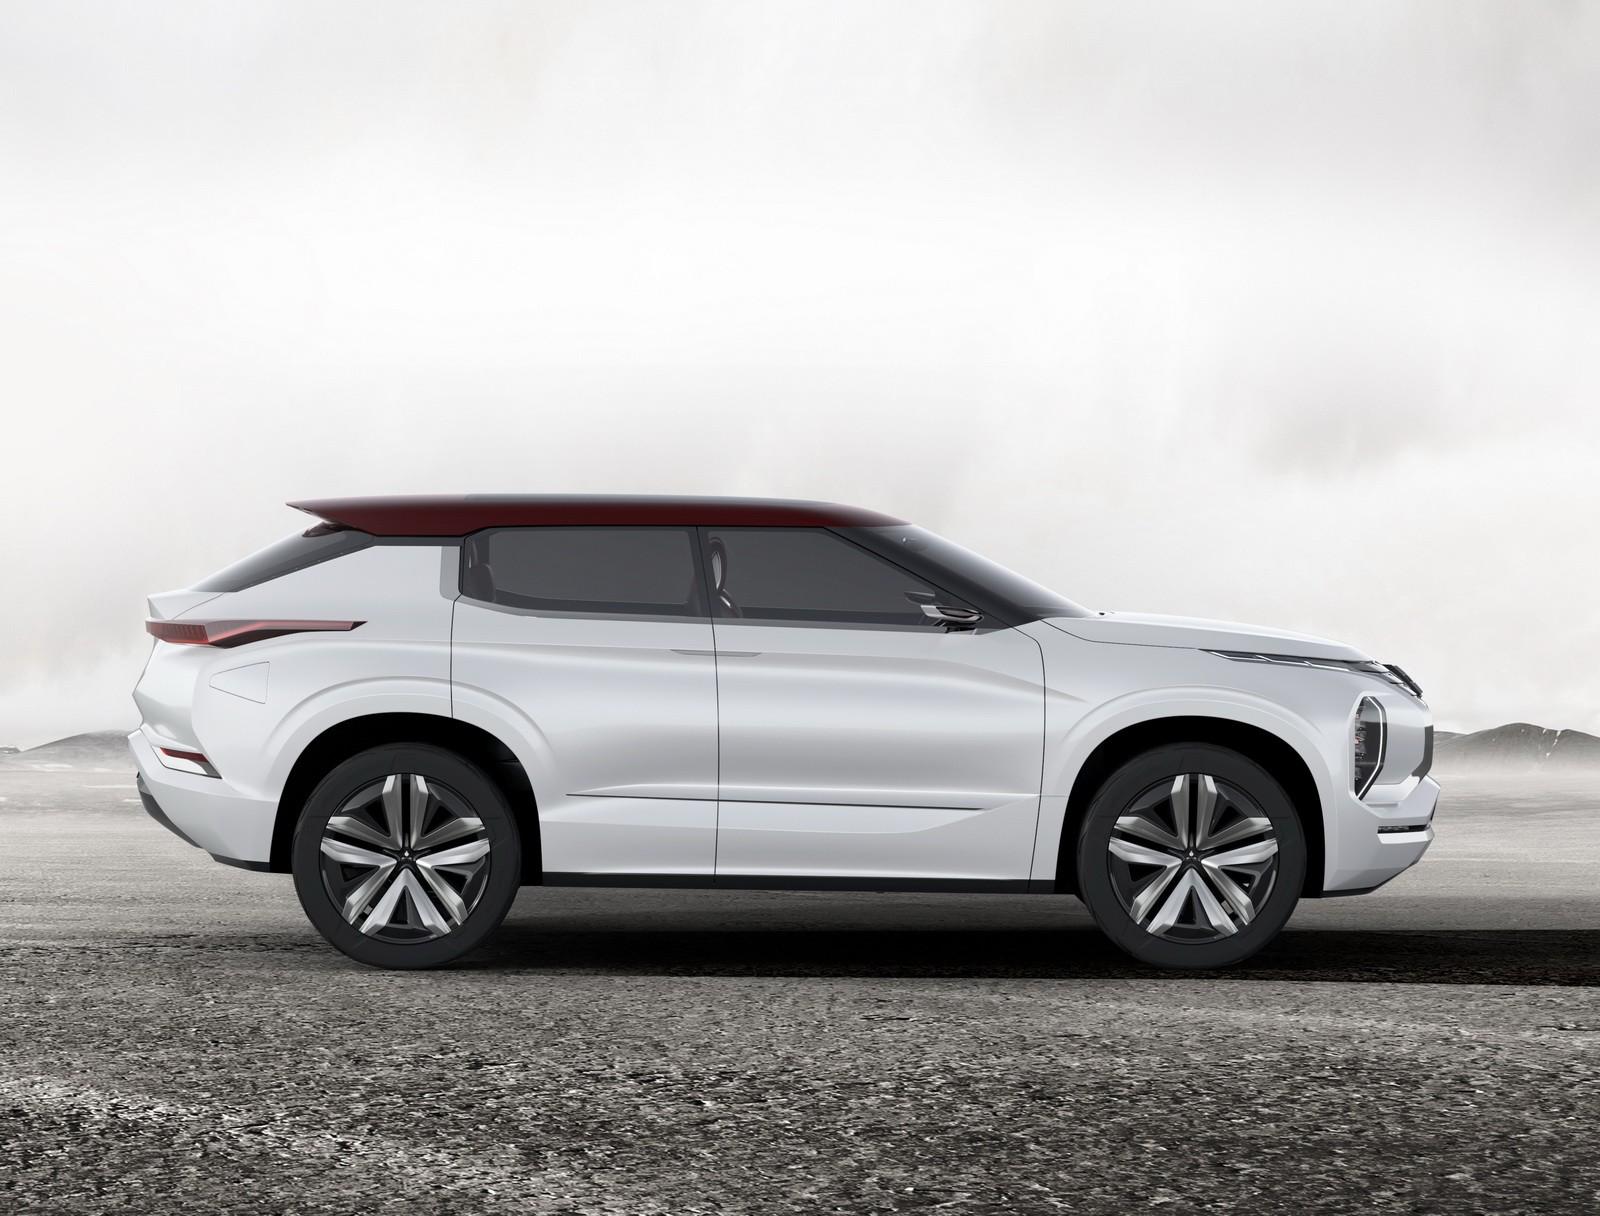 Used Mitsubishi Lancer >> Mitsubishi Grand Tourer PHEV Concept Revealed Ahead of Paris - autoevolution